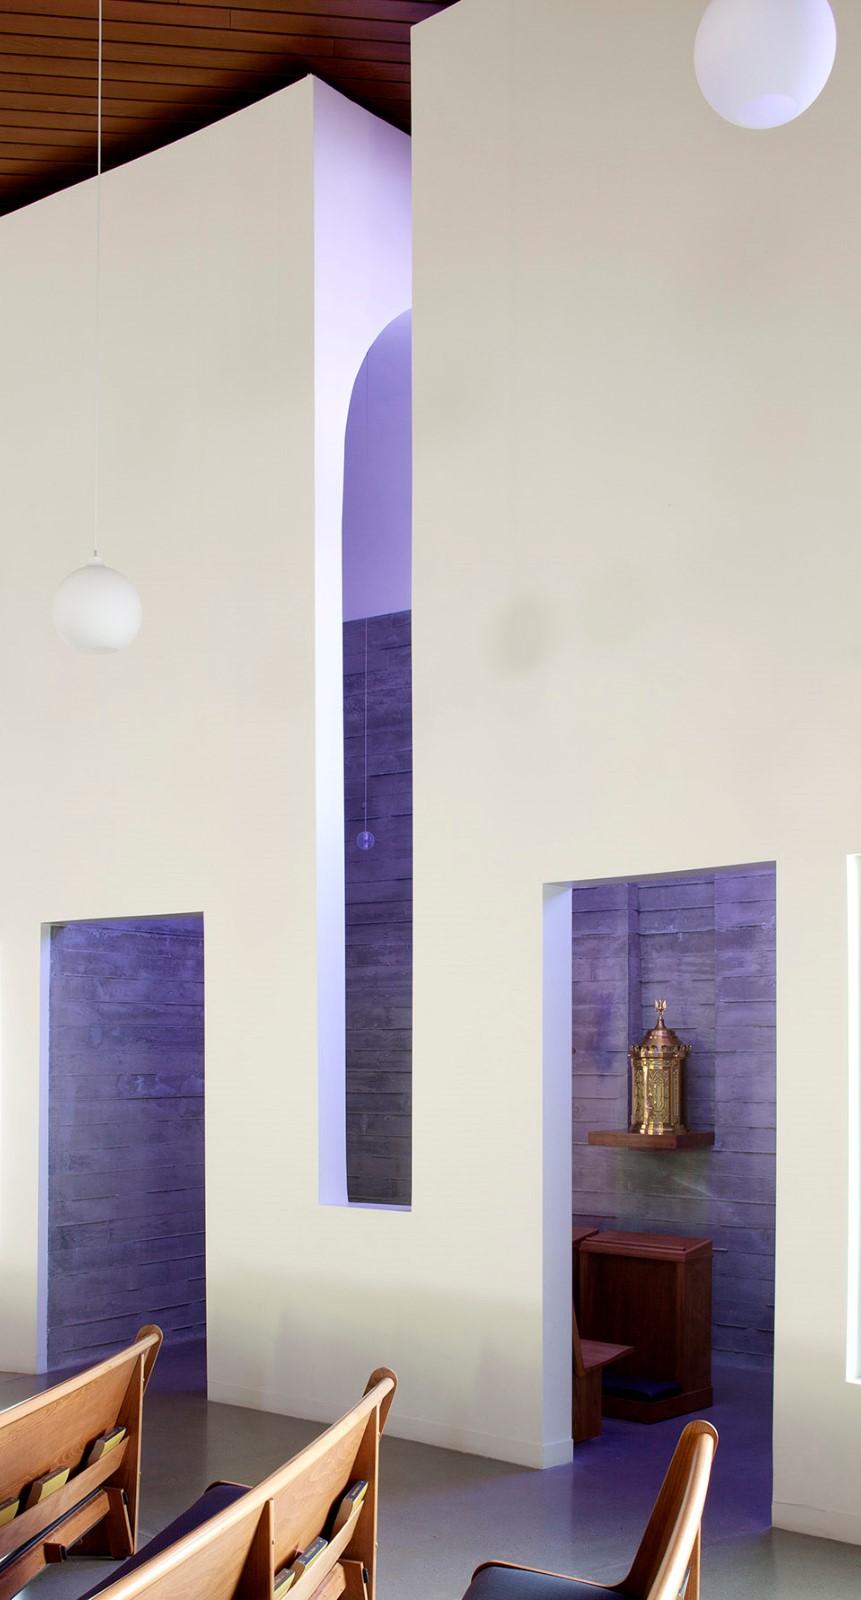 Saint Joseph工人教堂,美国犹他州 / Sparano + Mooney Architecture